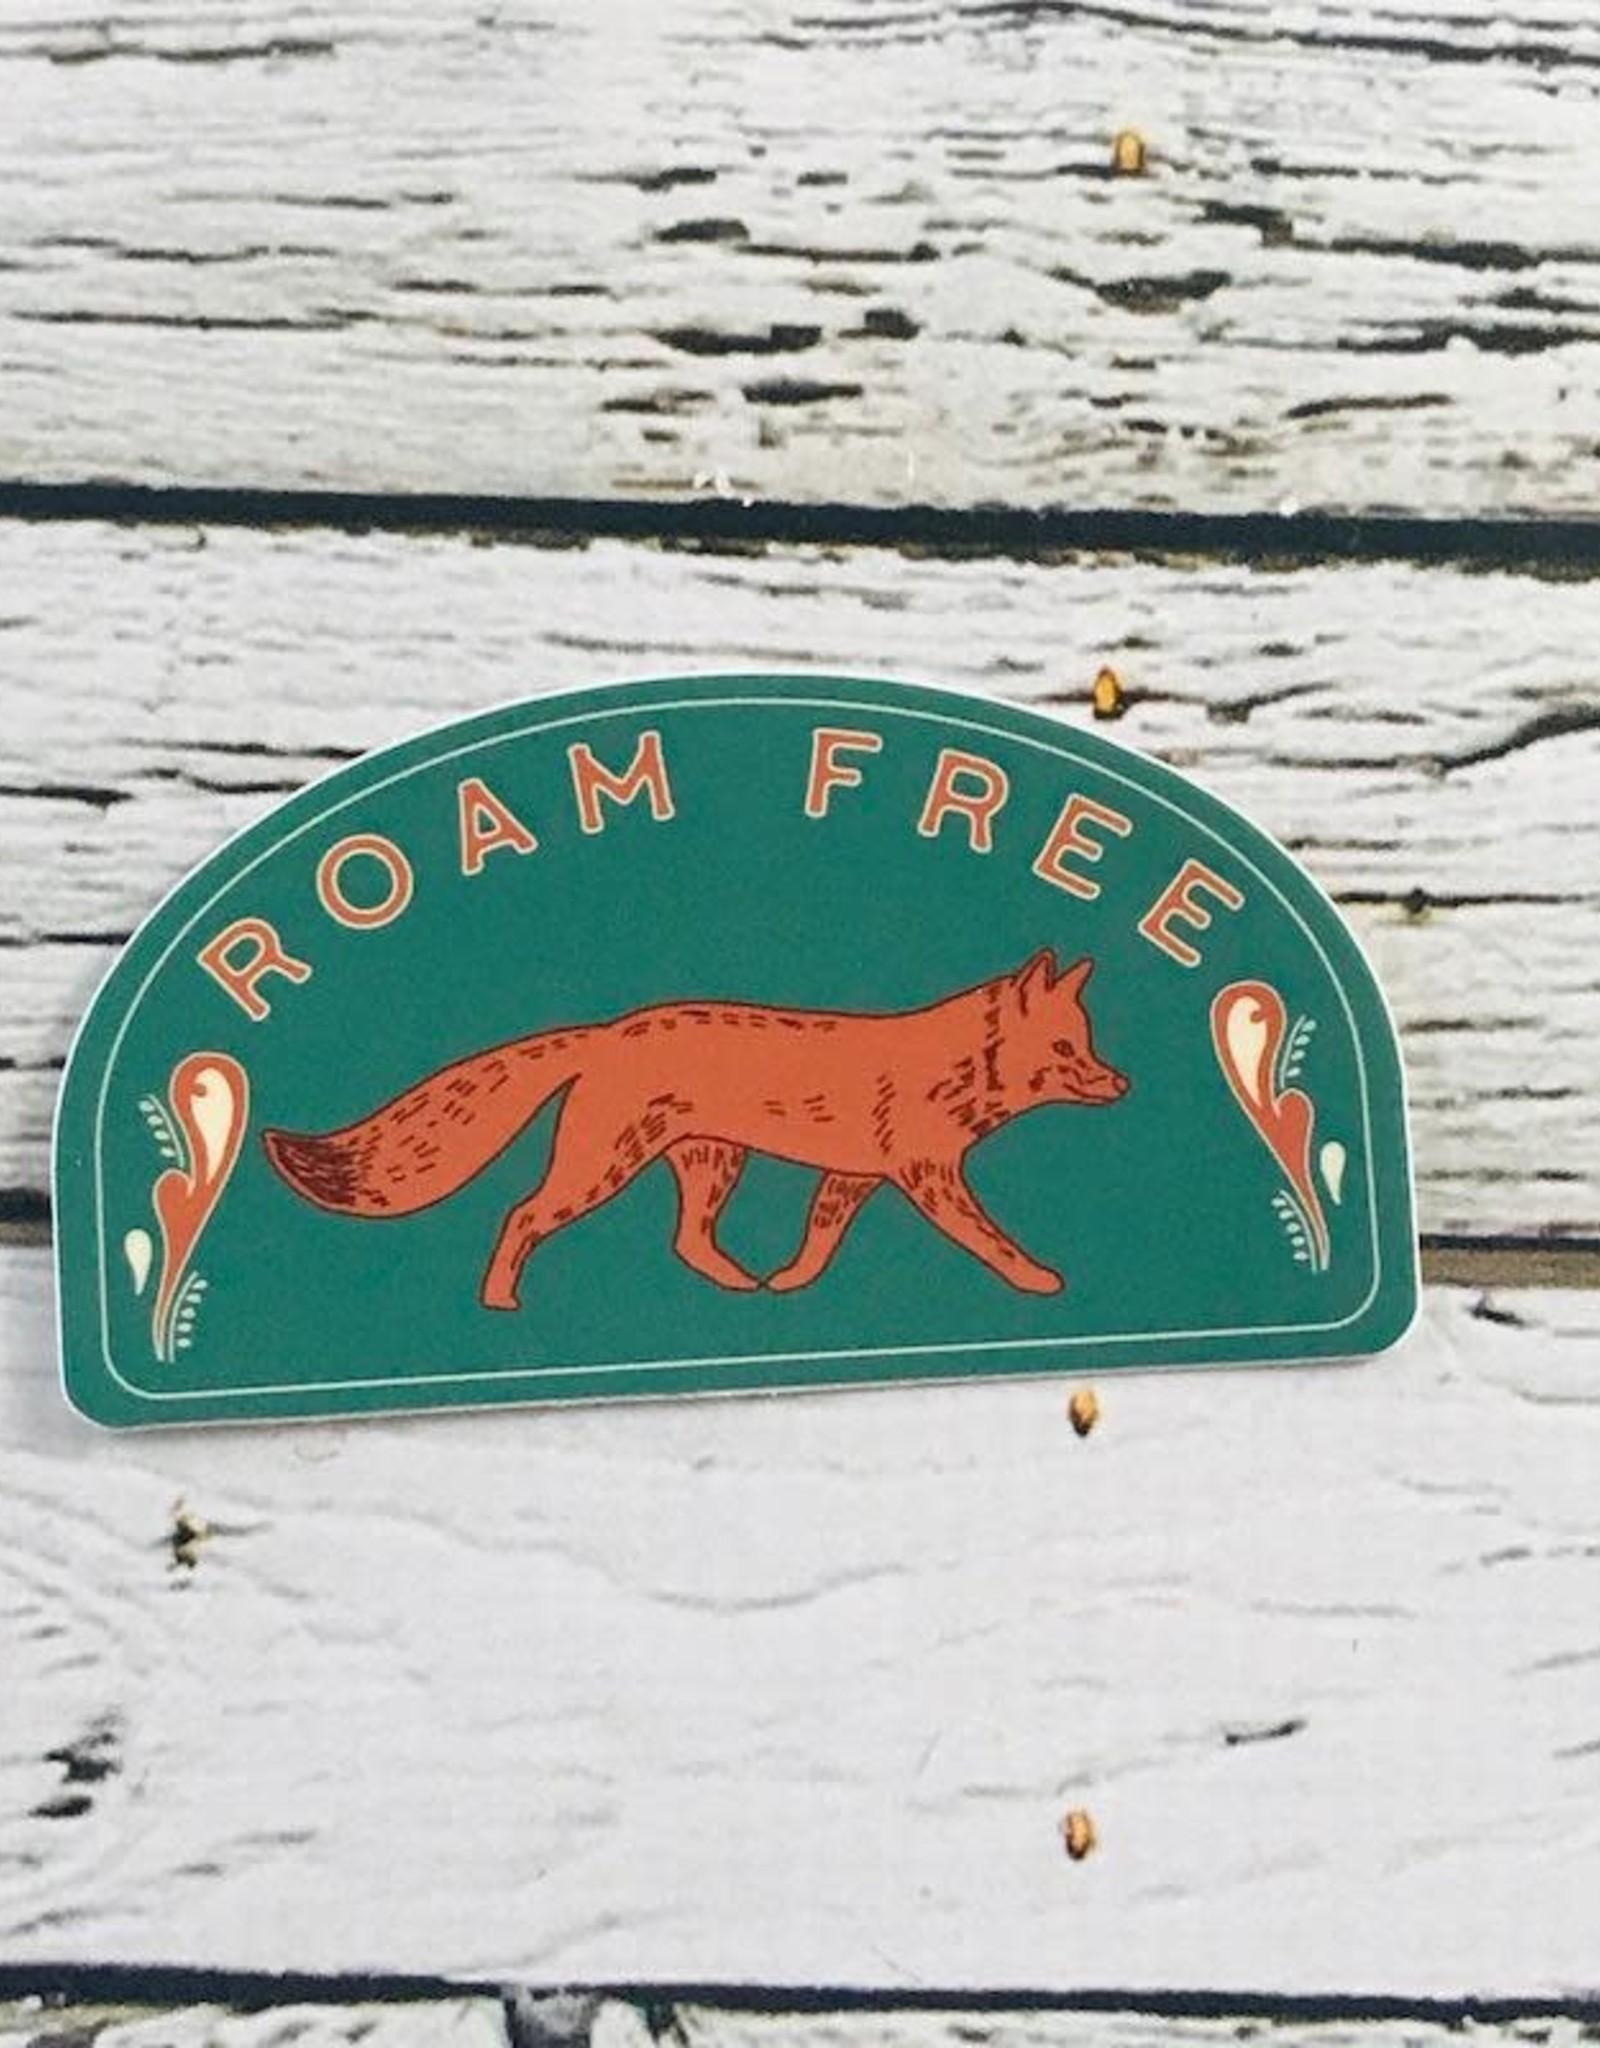 Roam Free Fox Sticker